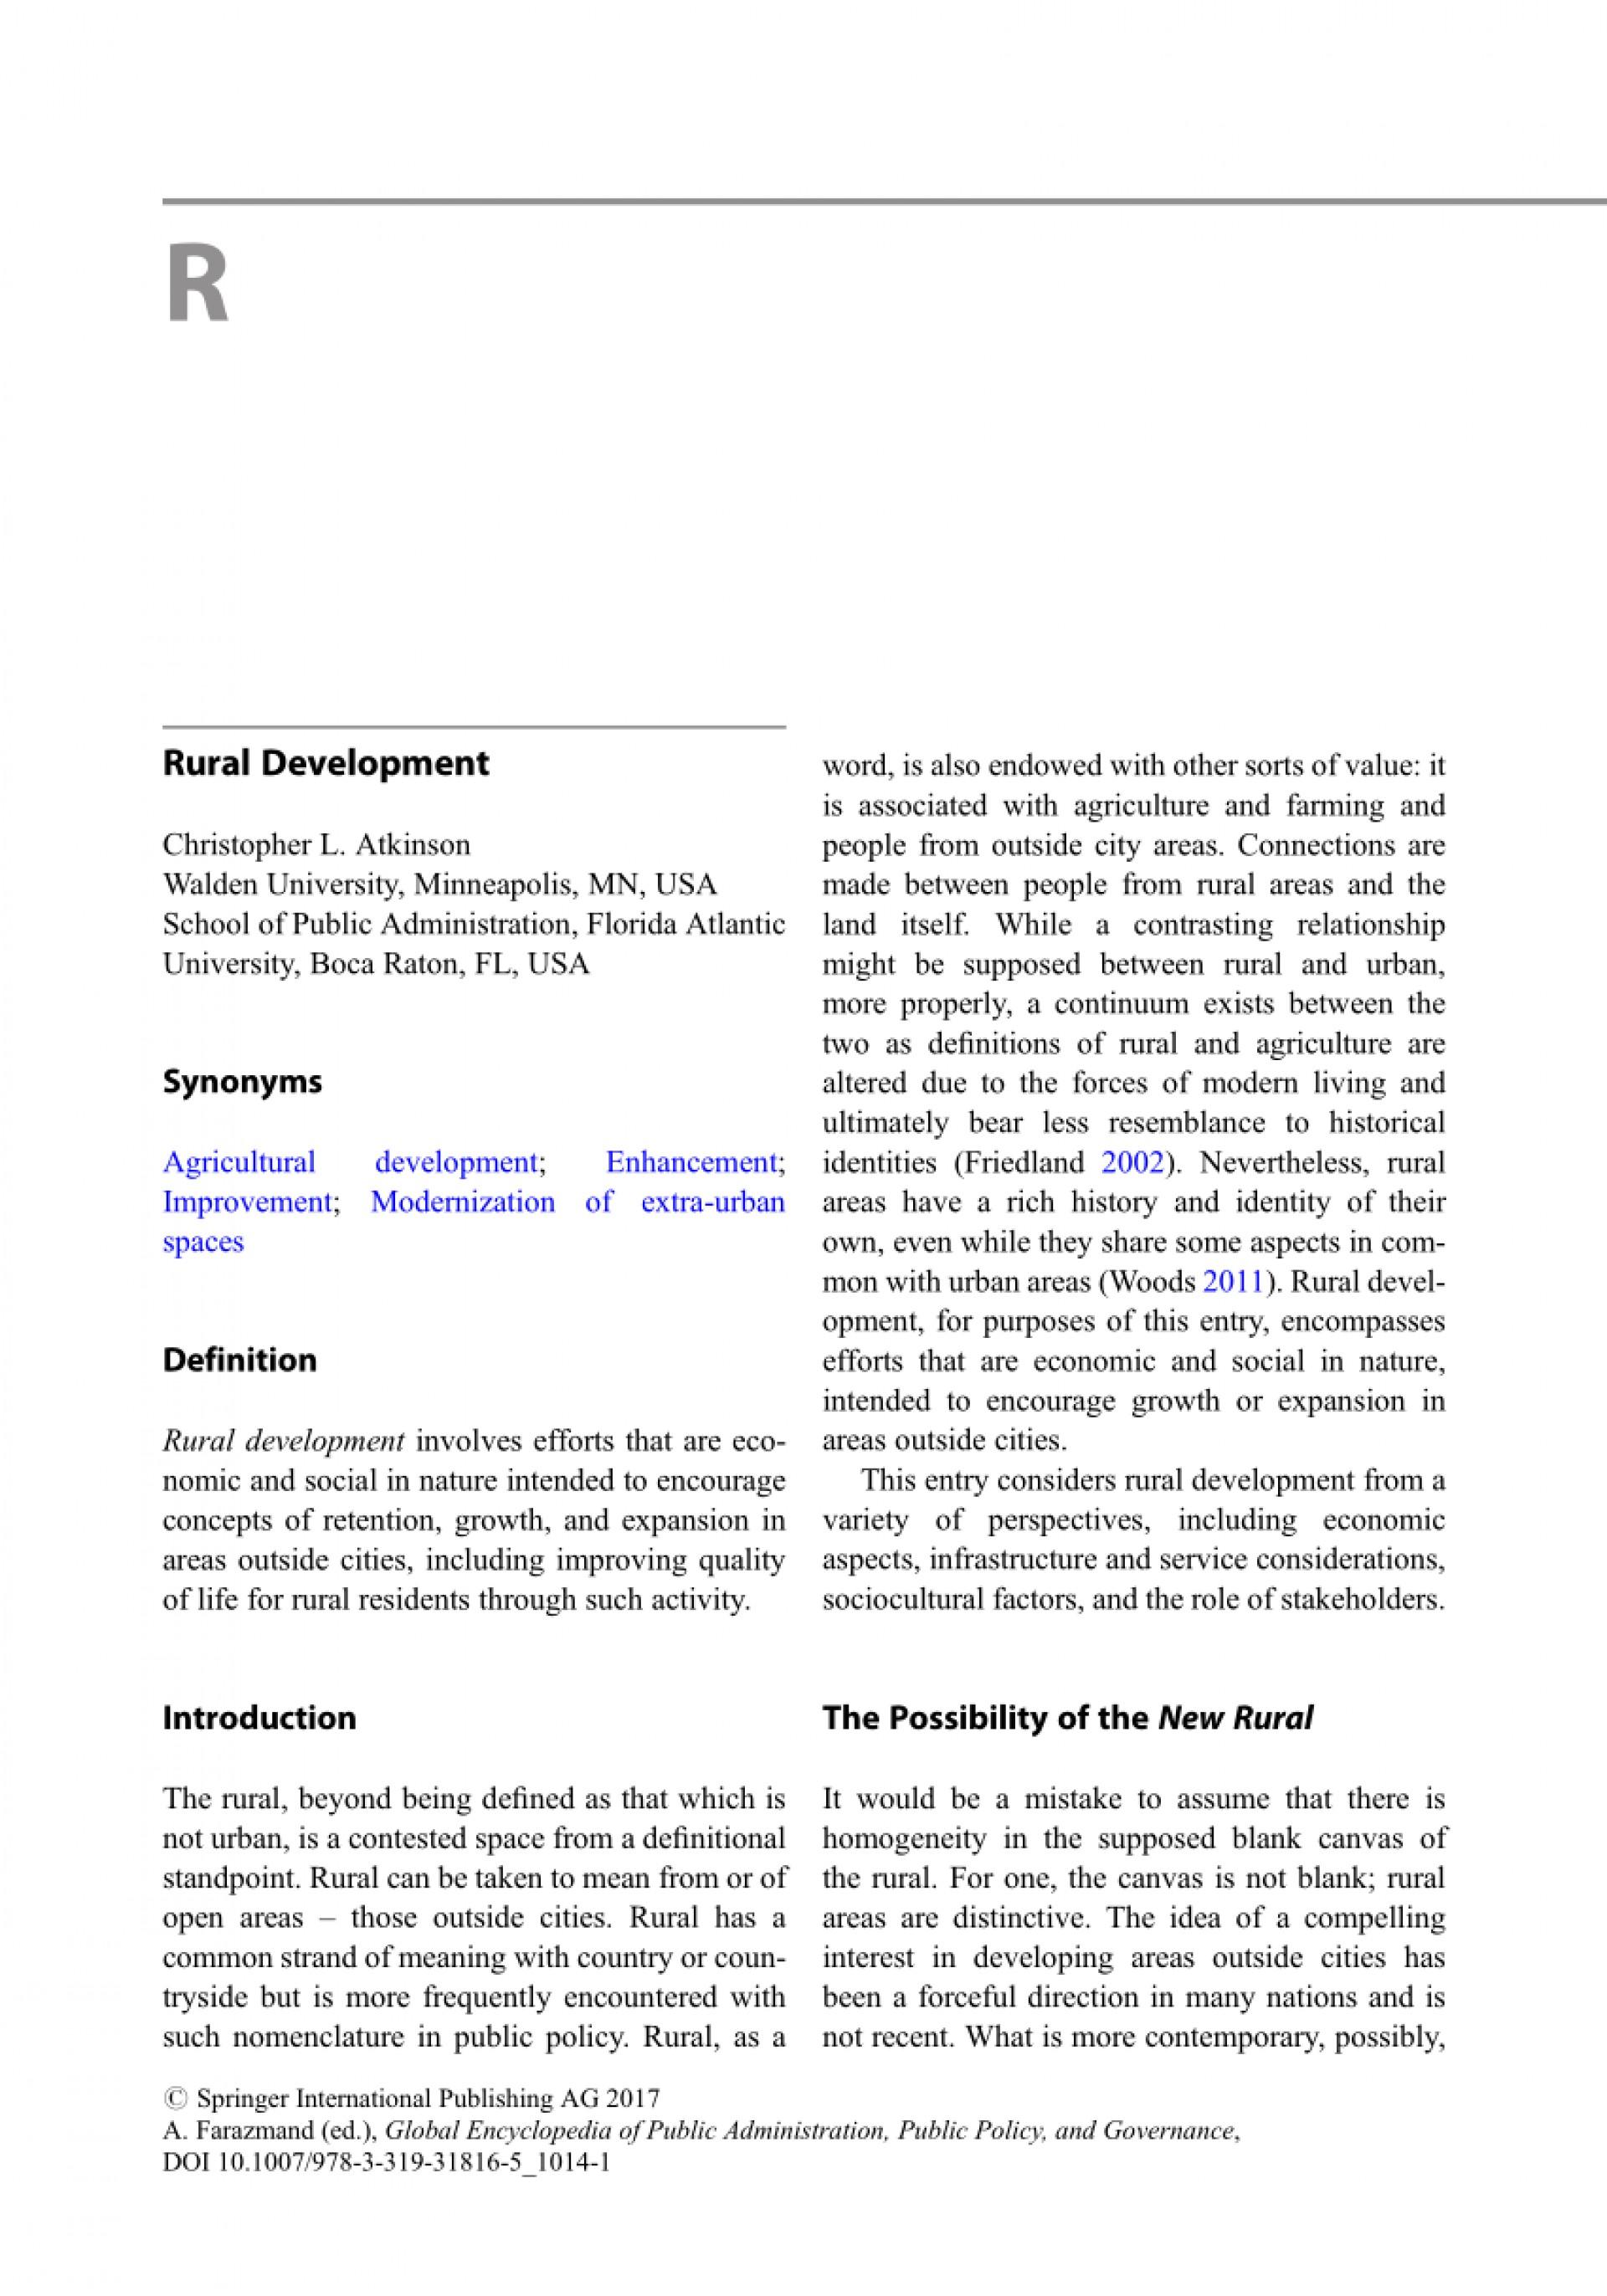 013 Essay Pdf Example Unbelievable Gujarati Free Download Argumentative Terrorism 1920